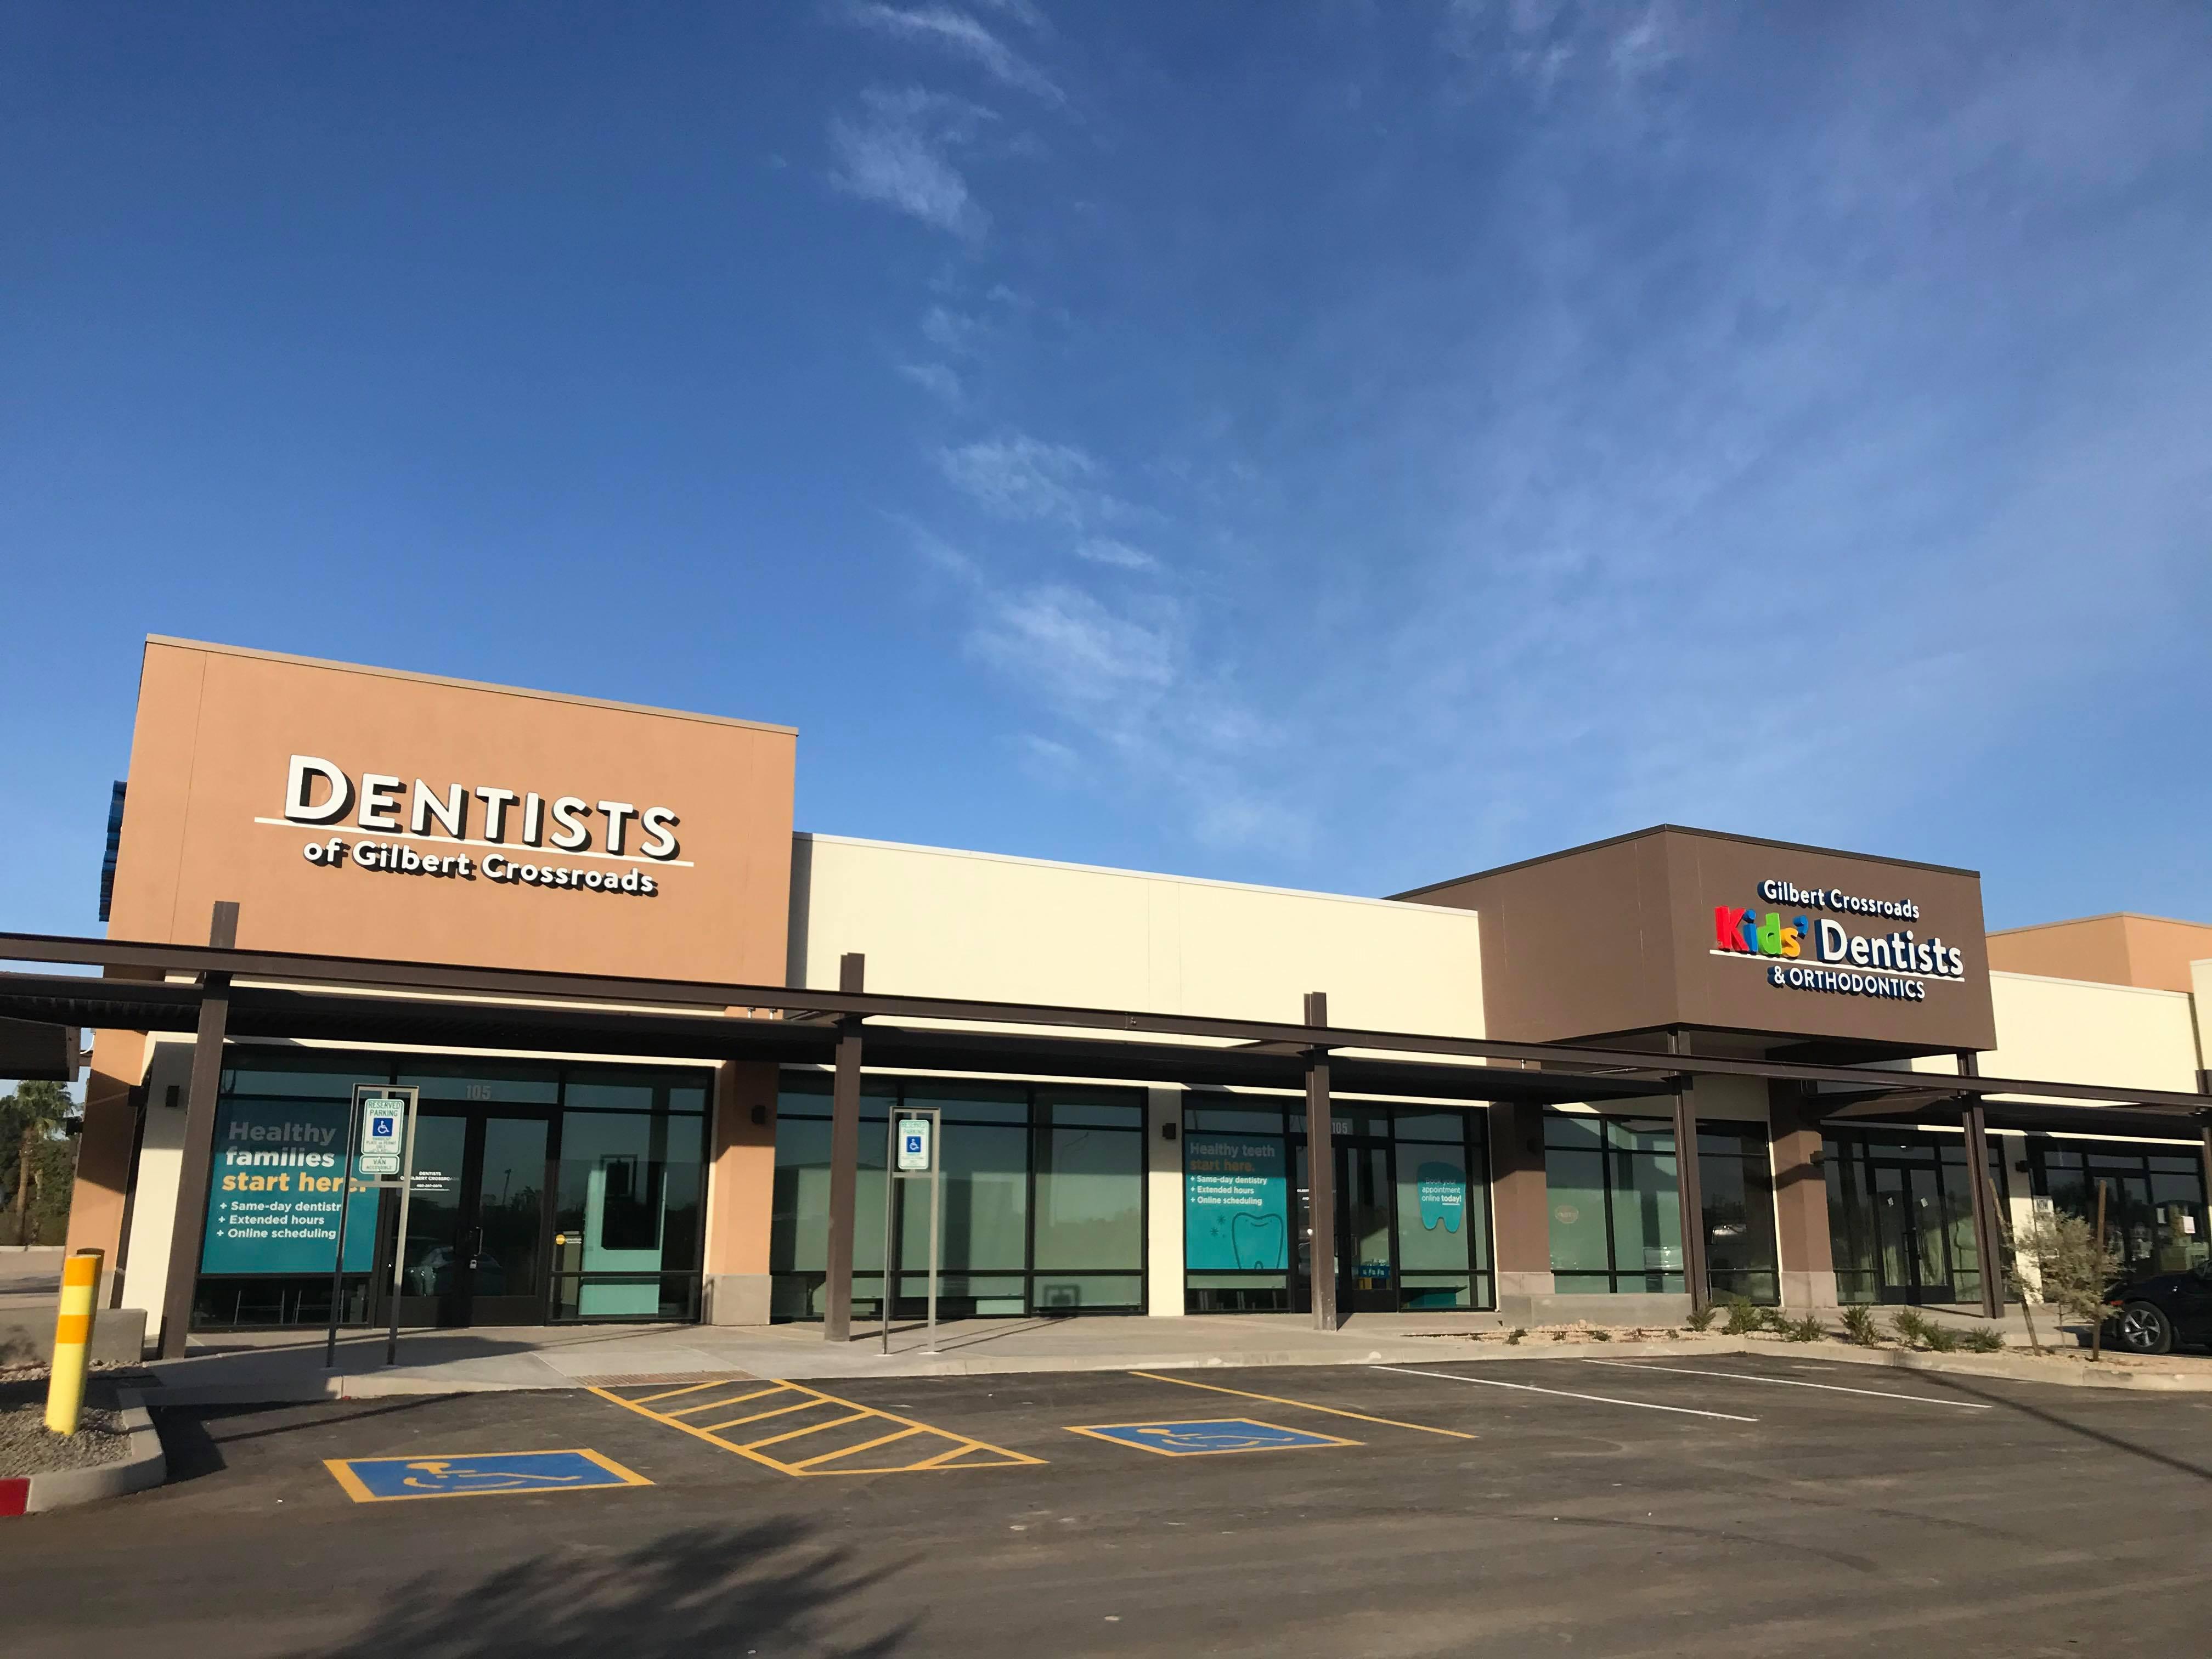 Gilbert Crossroads Kids' Dentists & Orthodontics